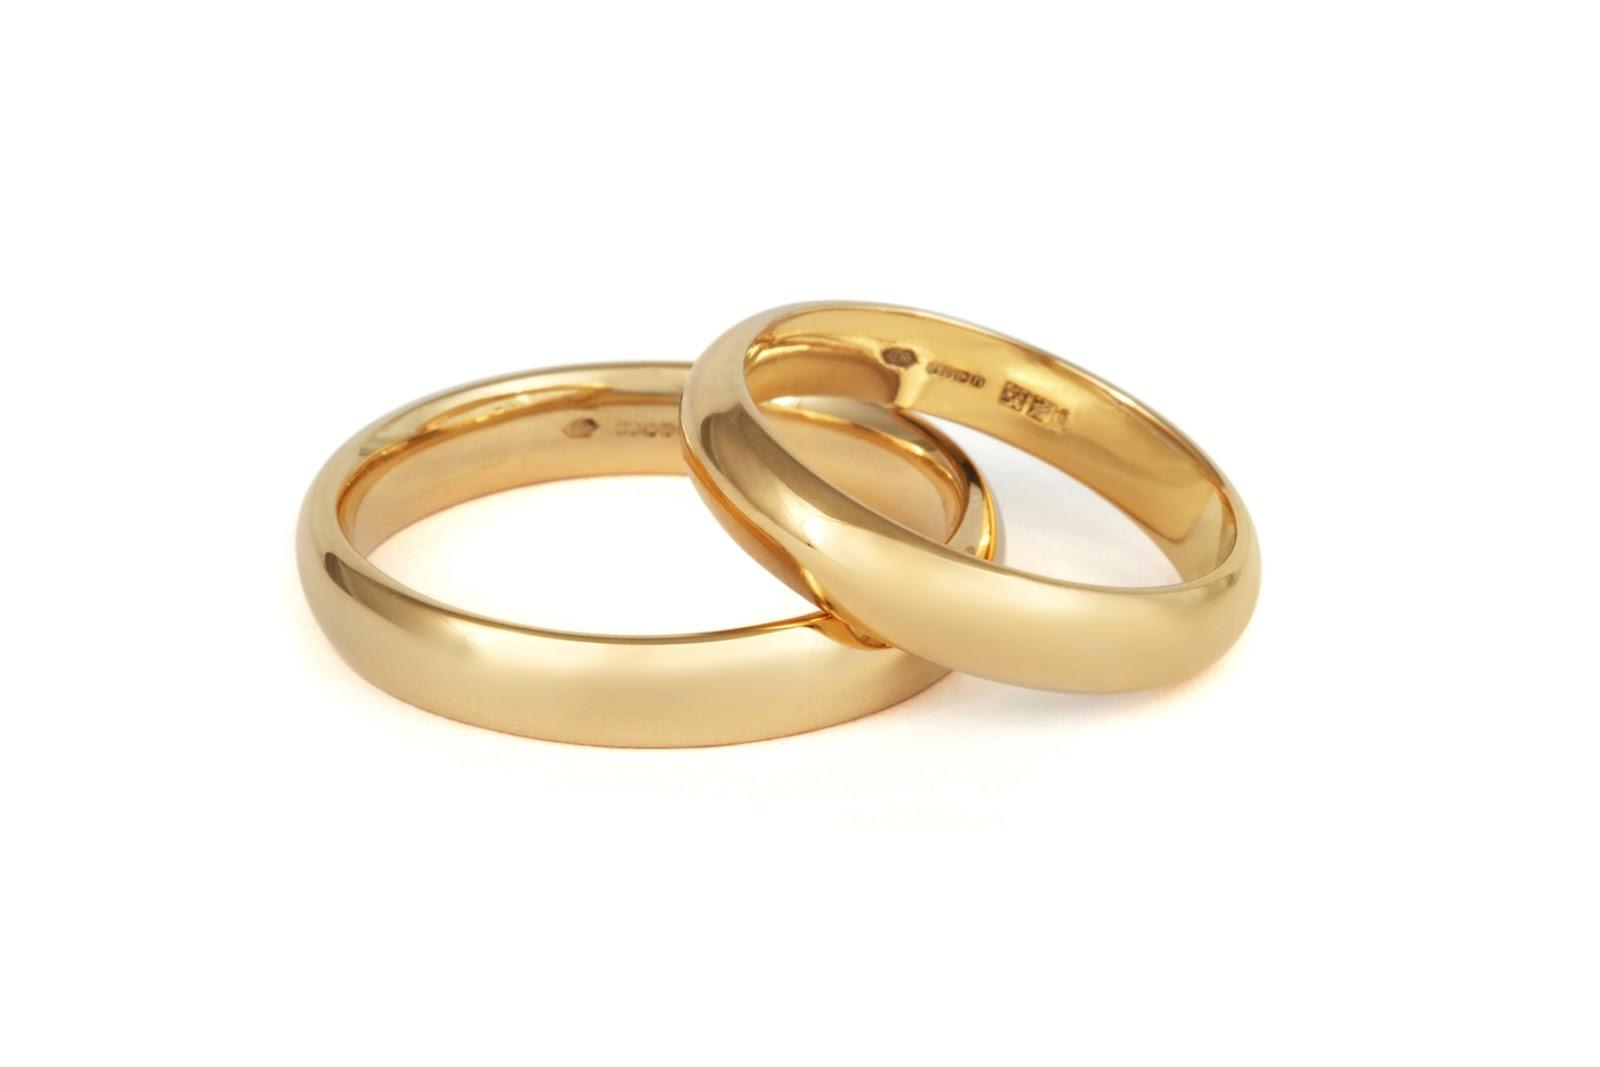 Matrimonial Matrimony Indian Matrimonial Portal The Wedding Ring in Christ